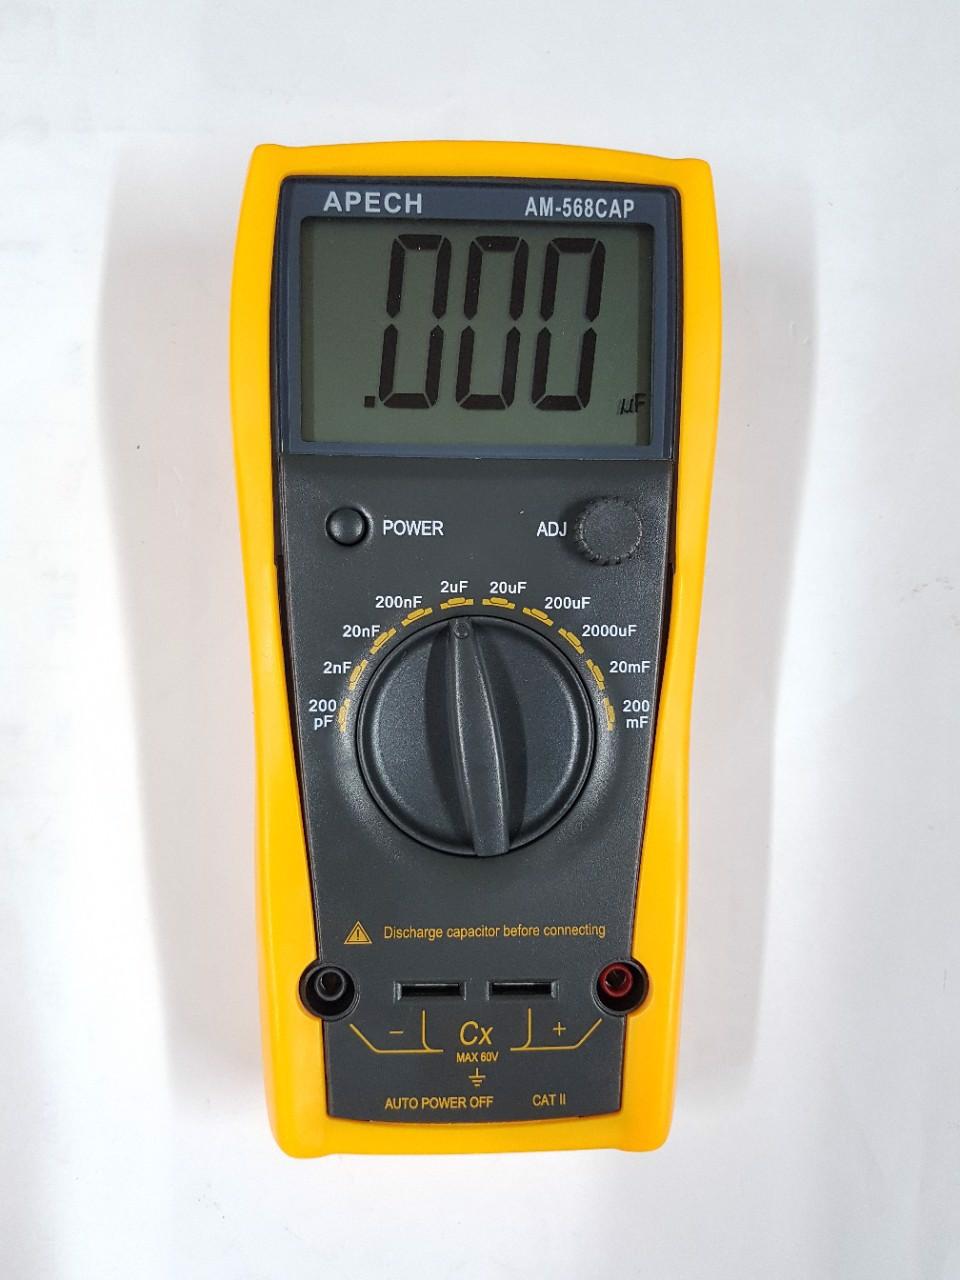 Đồng hồ đo tụ điện  APECH AM-568CAP